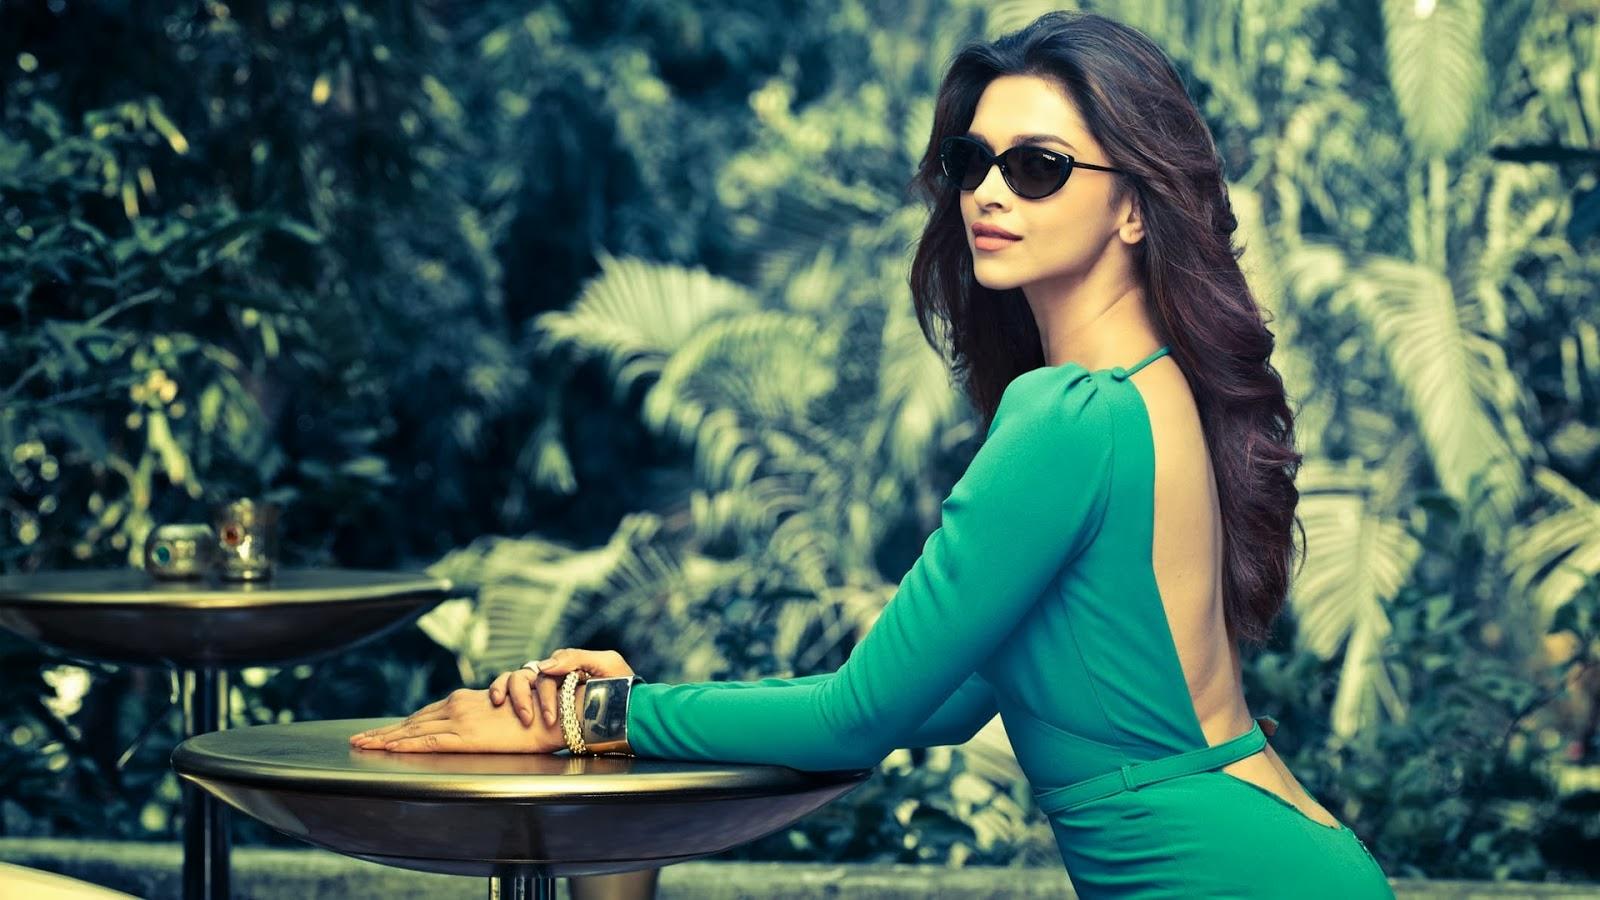 All Hot Informations: Download Deepika Padukone HD